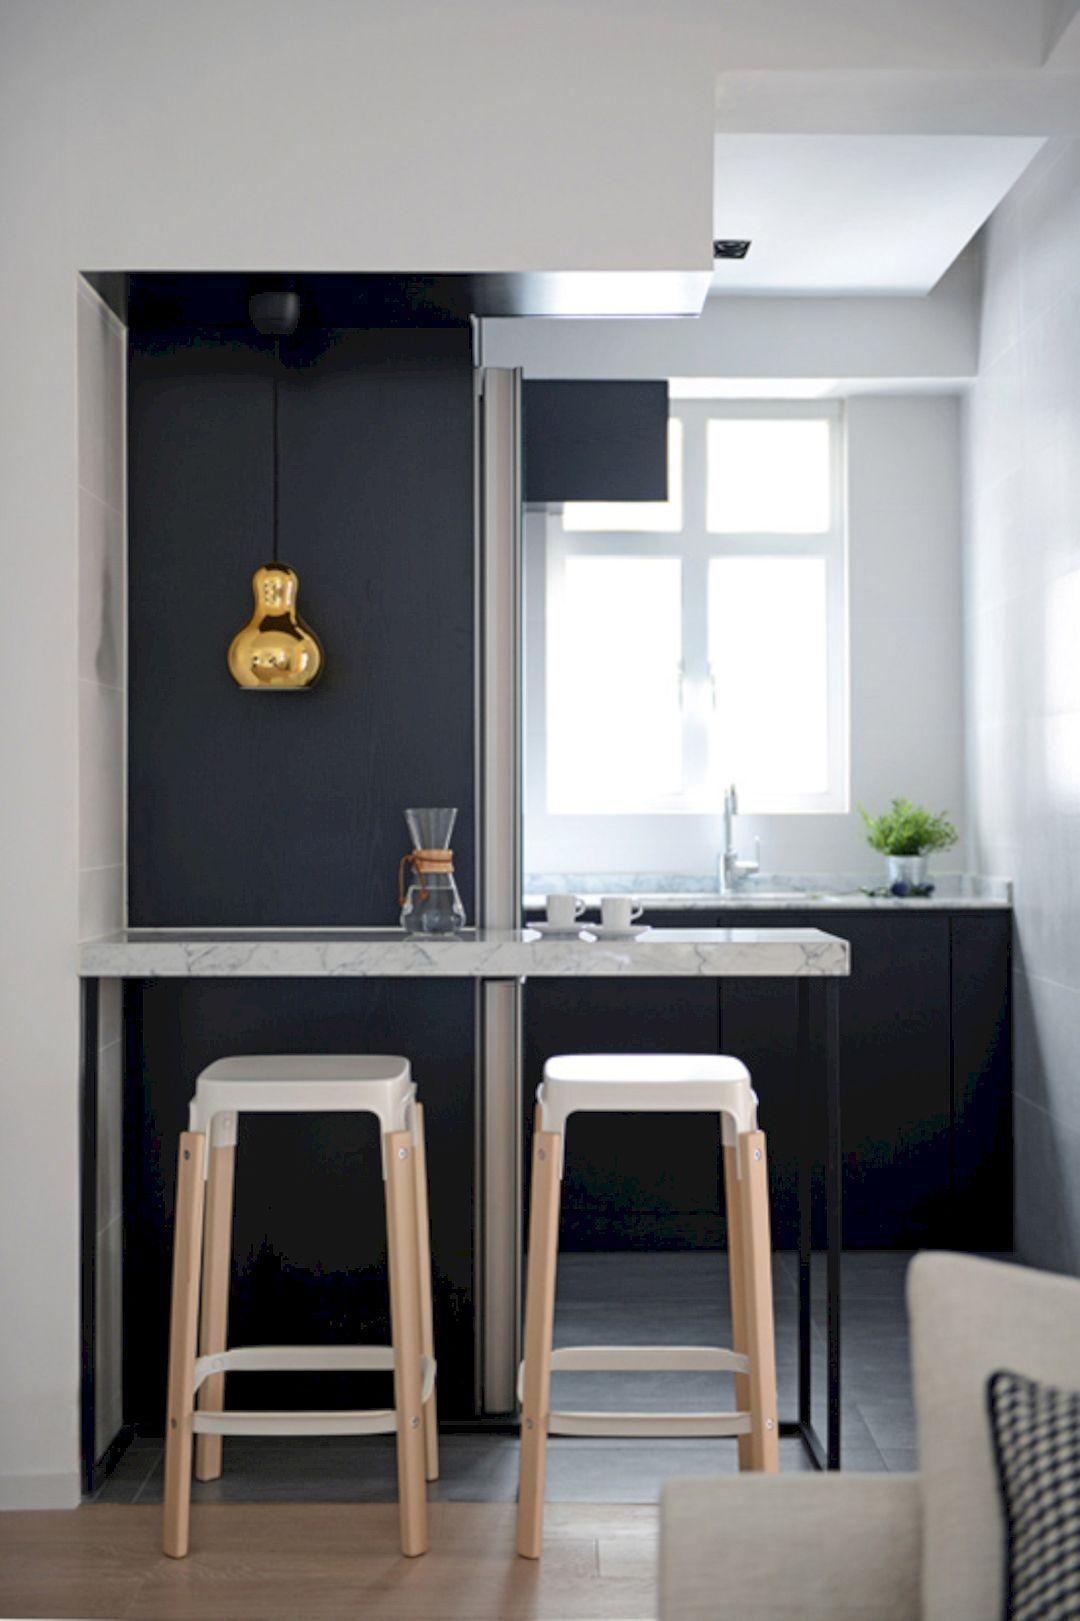 146 Amazing Small Kitchen Ideas that Perfect